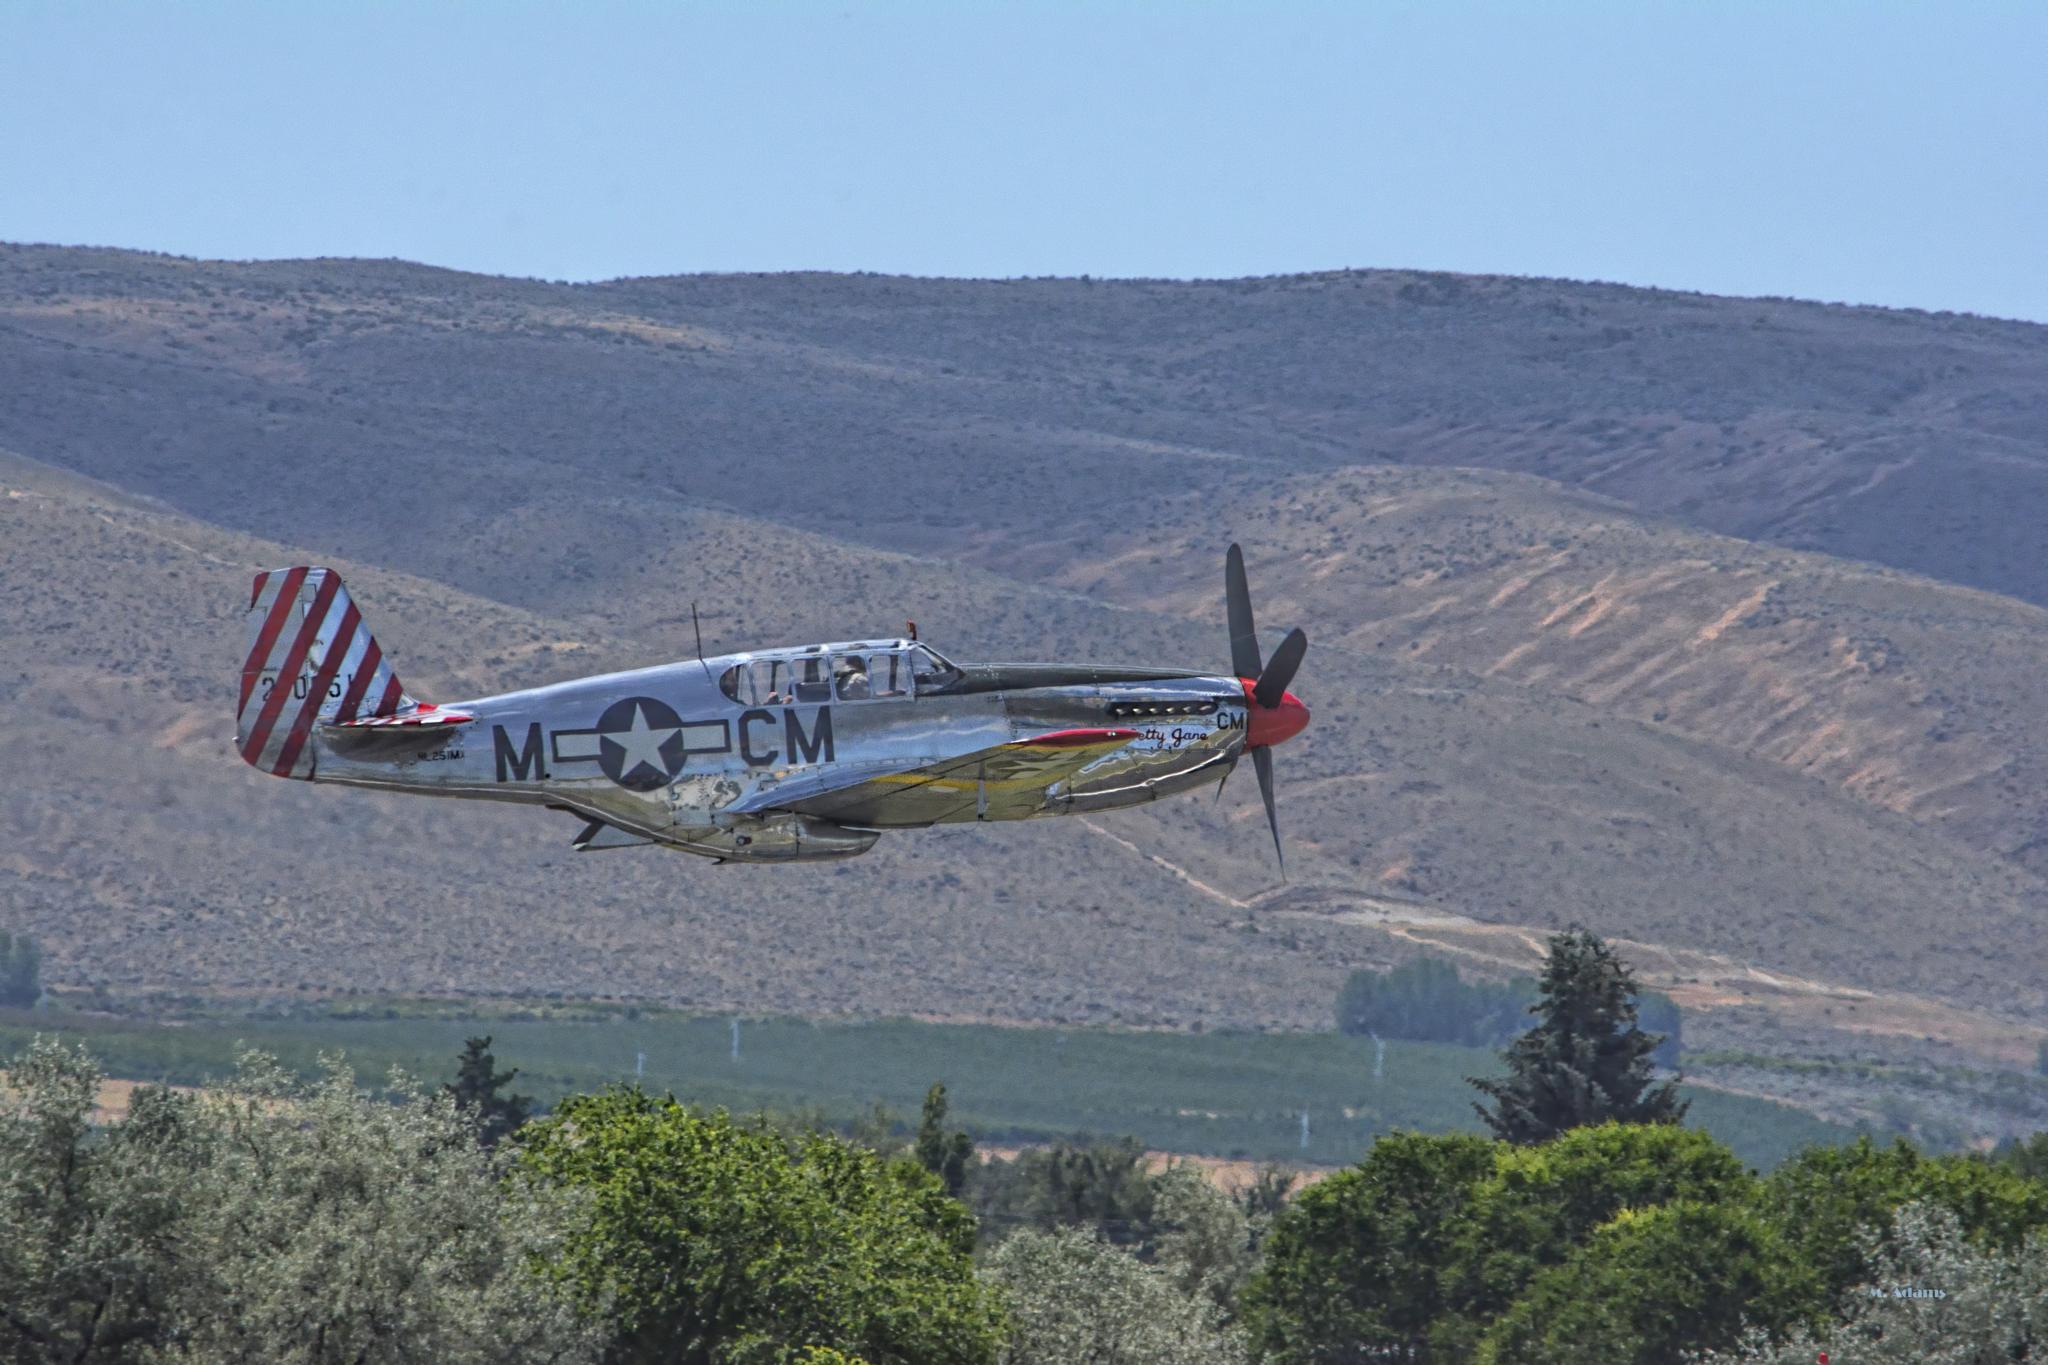 P-51 Mustang by Mike Adams